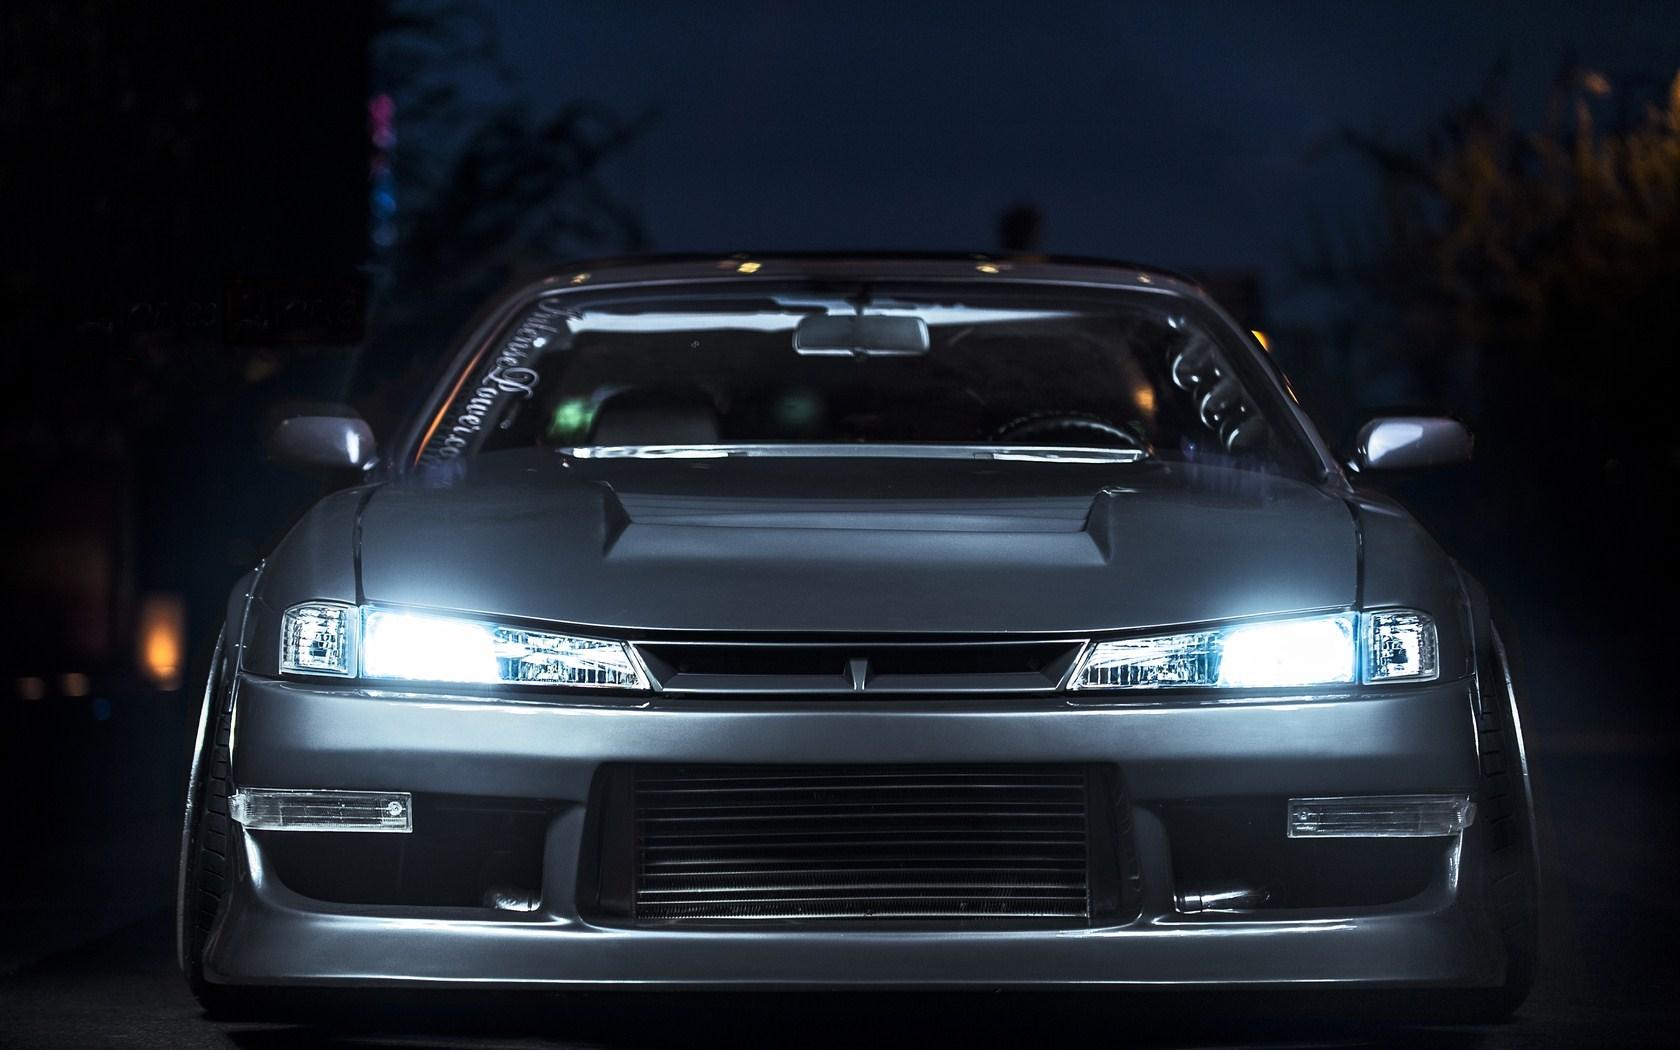 Nissan silva s14